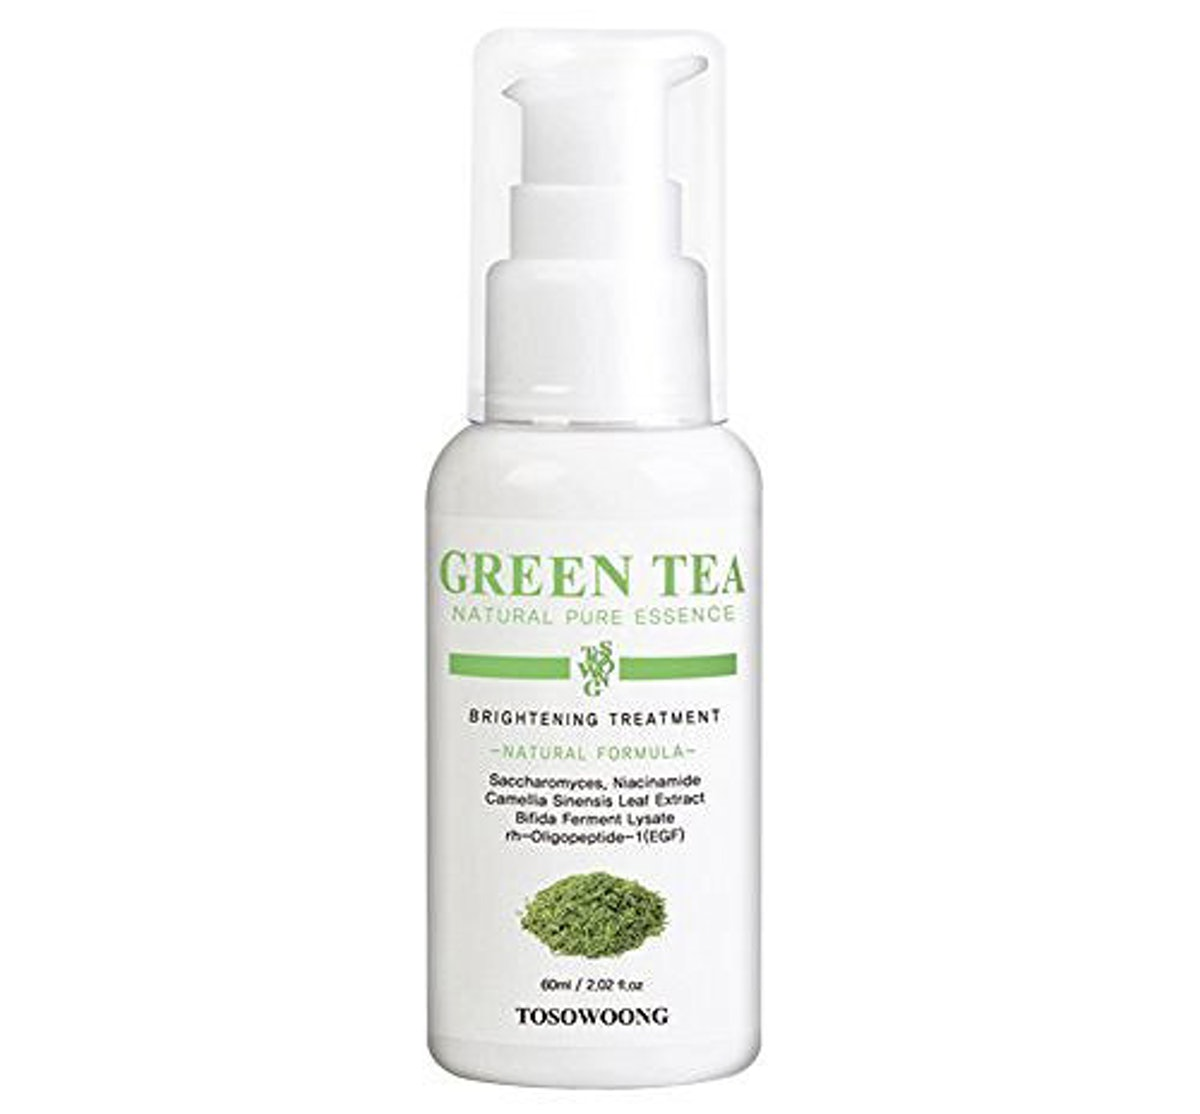 Tosowoong Green Tea Essence, 60 Milliliter